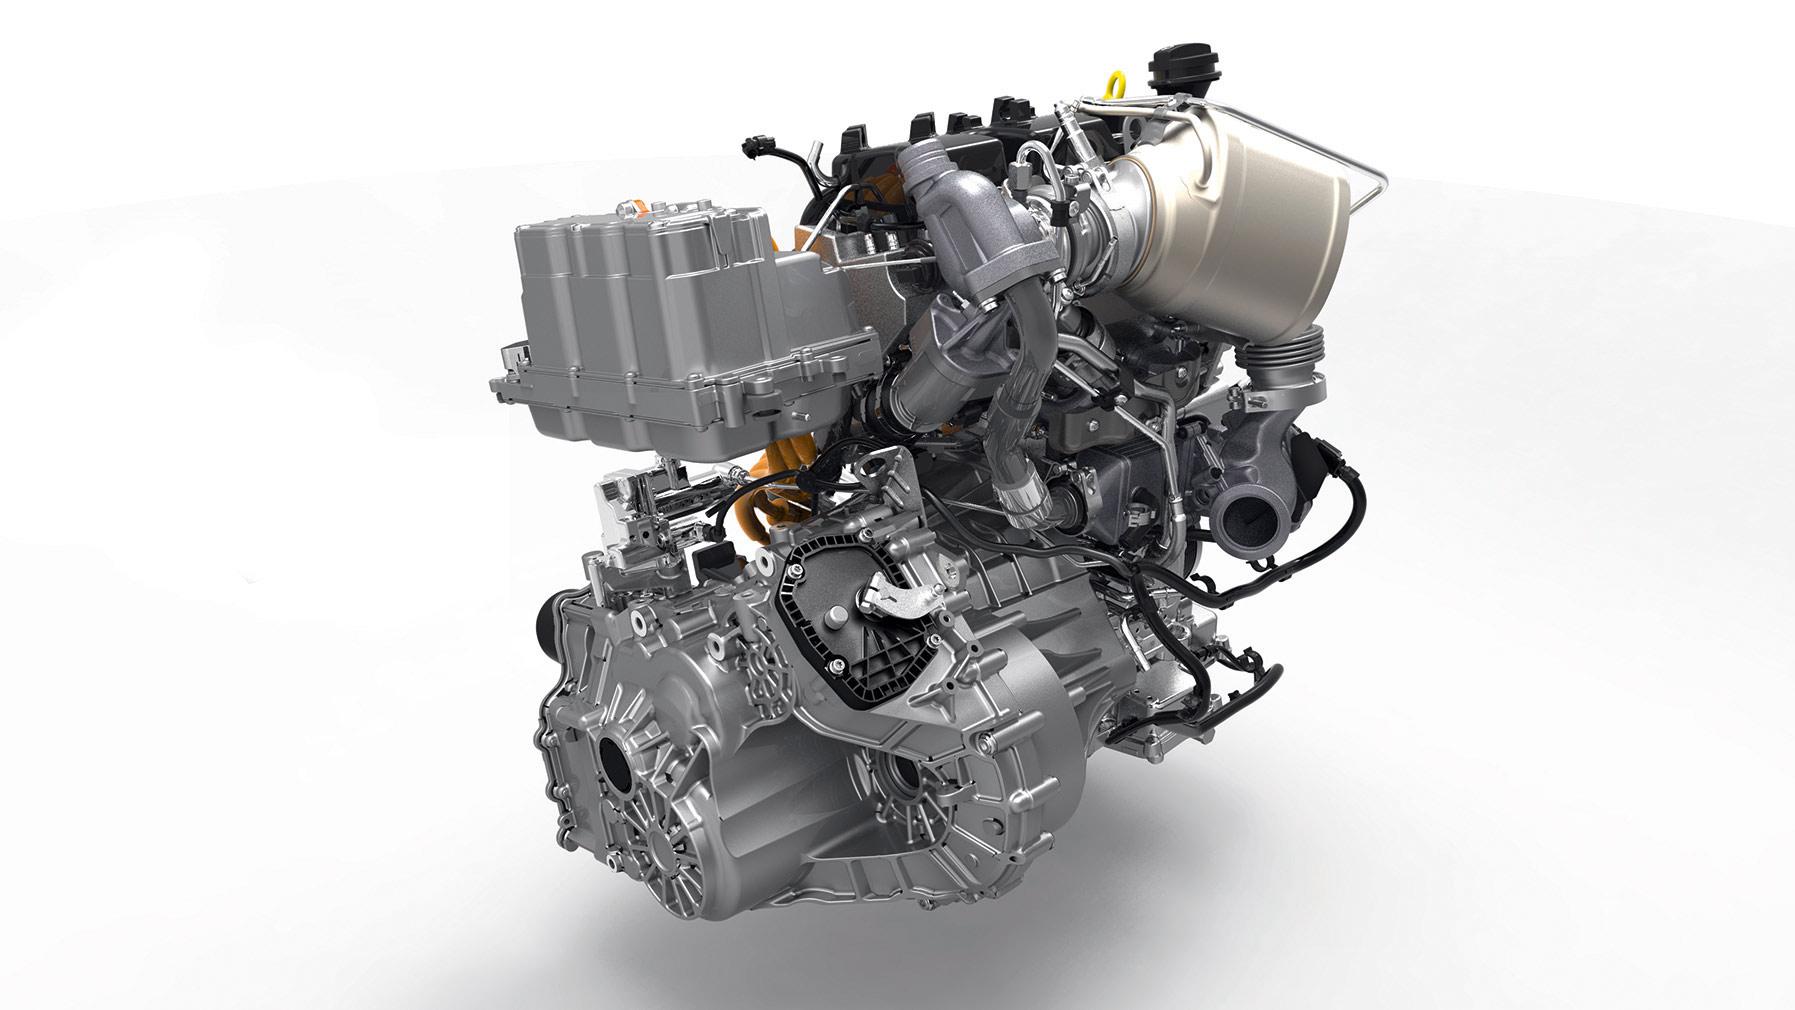 Audi Q5 test mule 301 110x60 photo